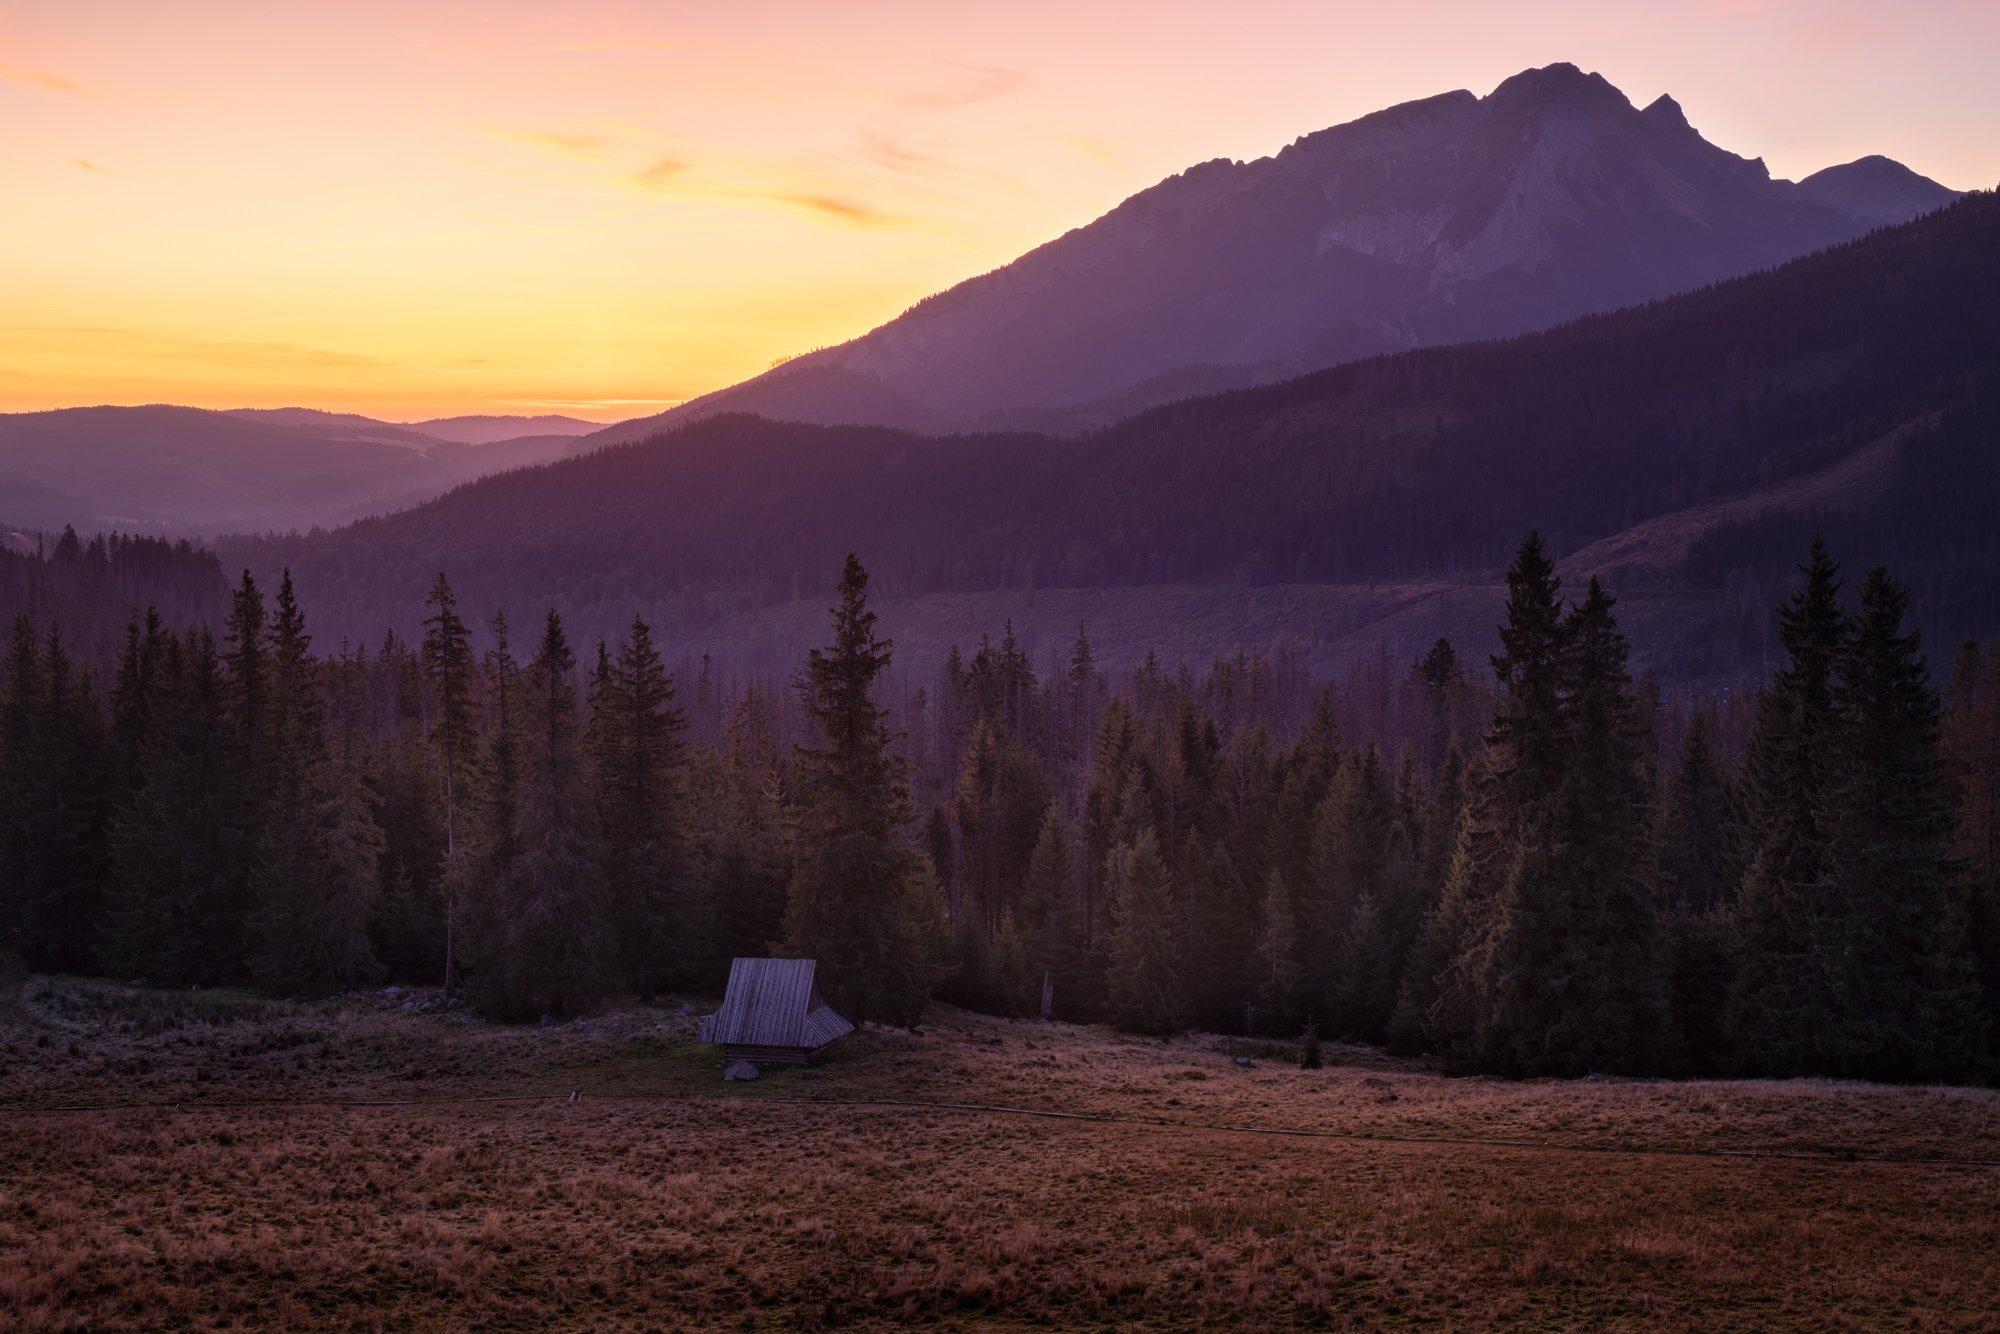 landscape nature nikon scenic, poland, tatry, sunrise, light, sun, colors, Imiełowski Grzegorz